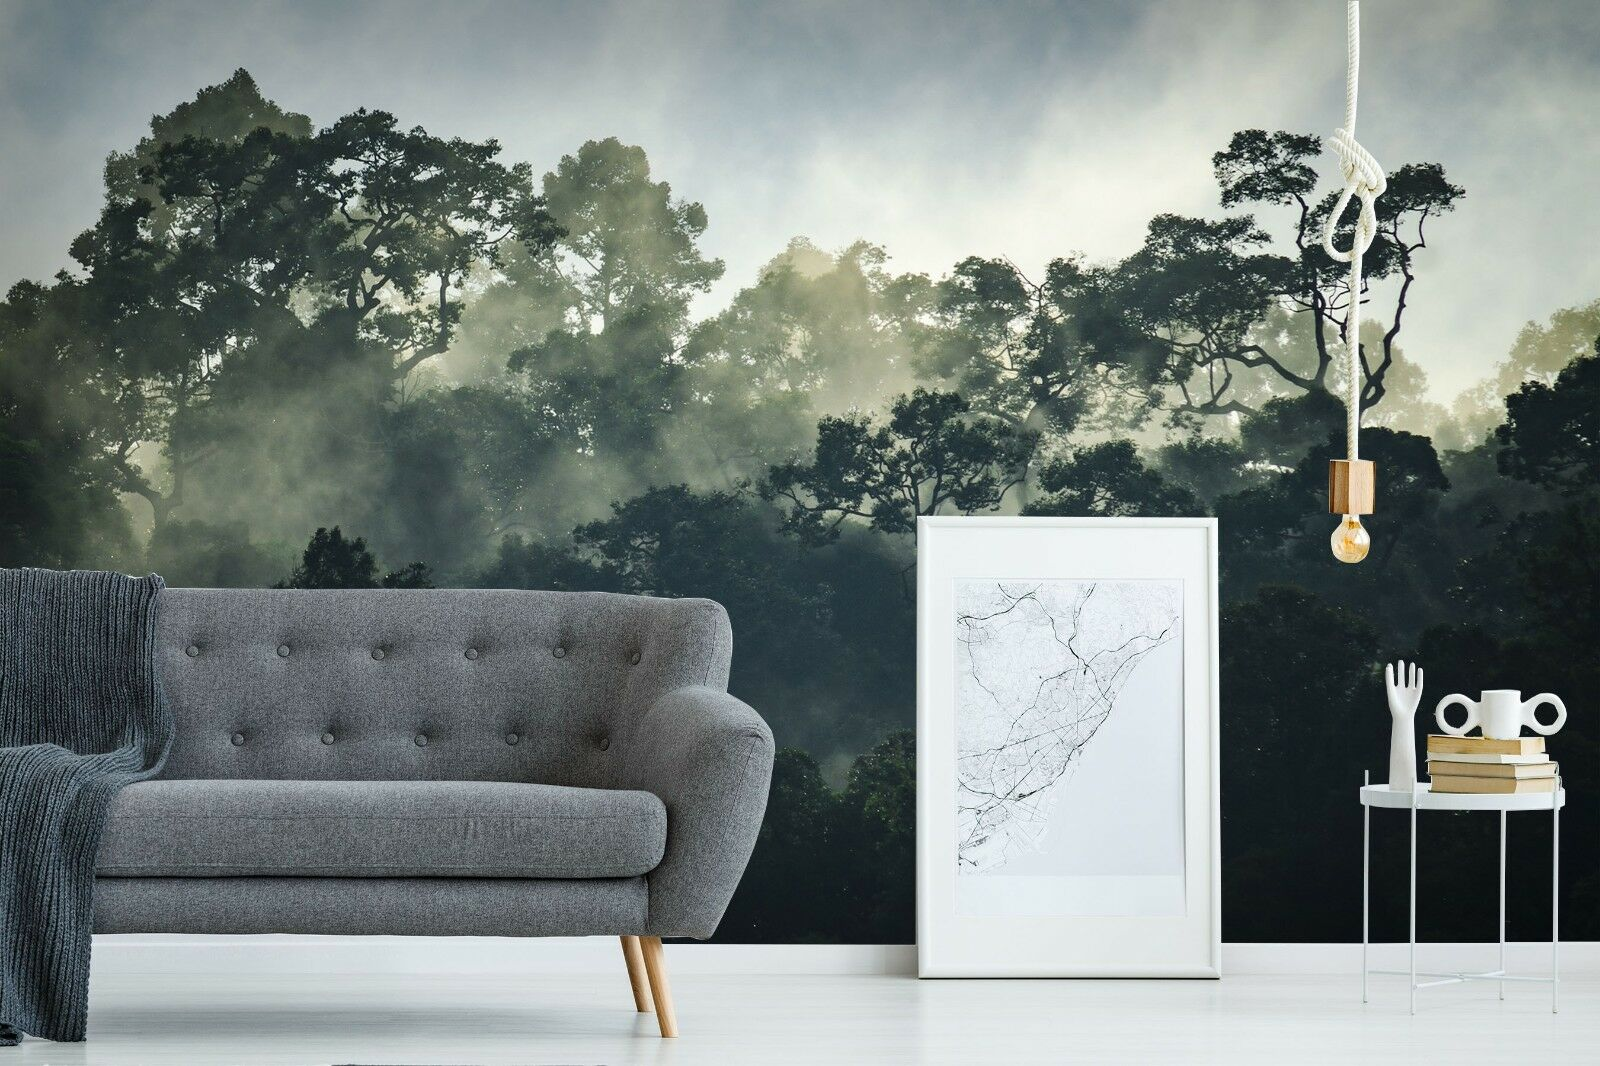 3D Grün Tree 7024 Wall Paper Print Wall Decal Deco Indoor Wall Murals US Summer